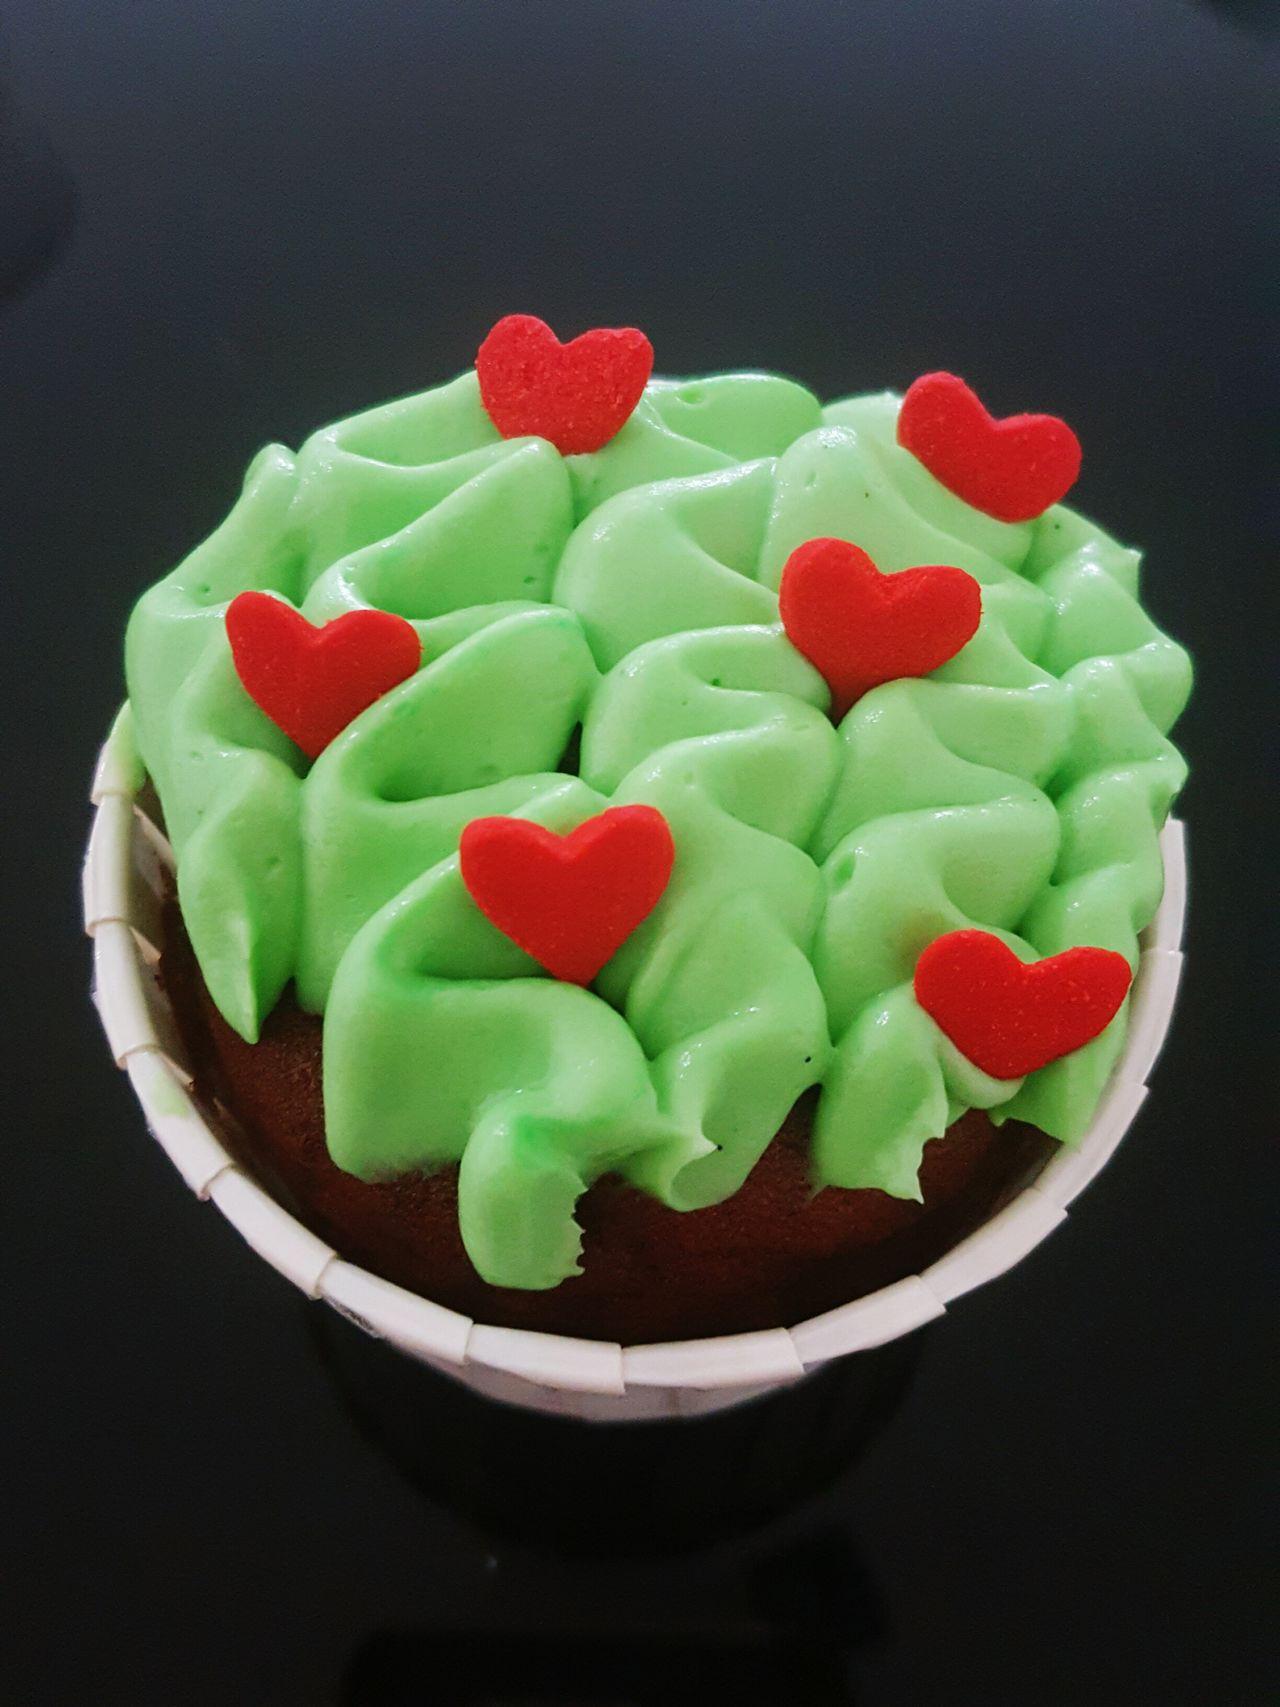 Dessert Creamcheesefrosting Creamcheese Green Xmas🎄 Cupcakes Homemade Cakestagram Xmascake Vanillaspecks Cocoa Xmas Cakes Homebaked Hearts Heartshaped Redhearts